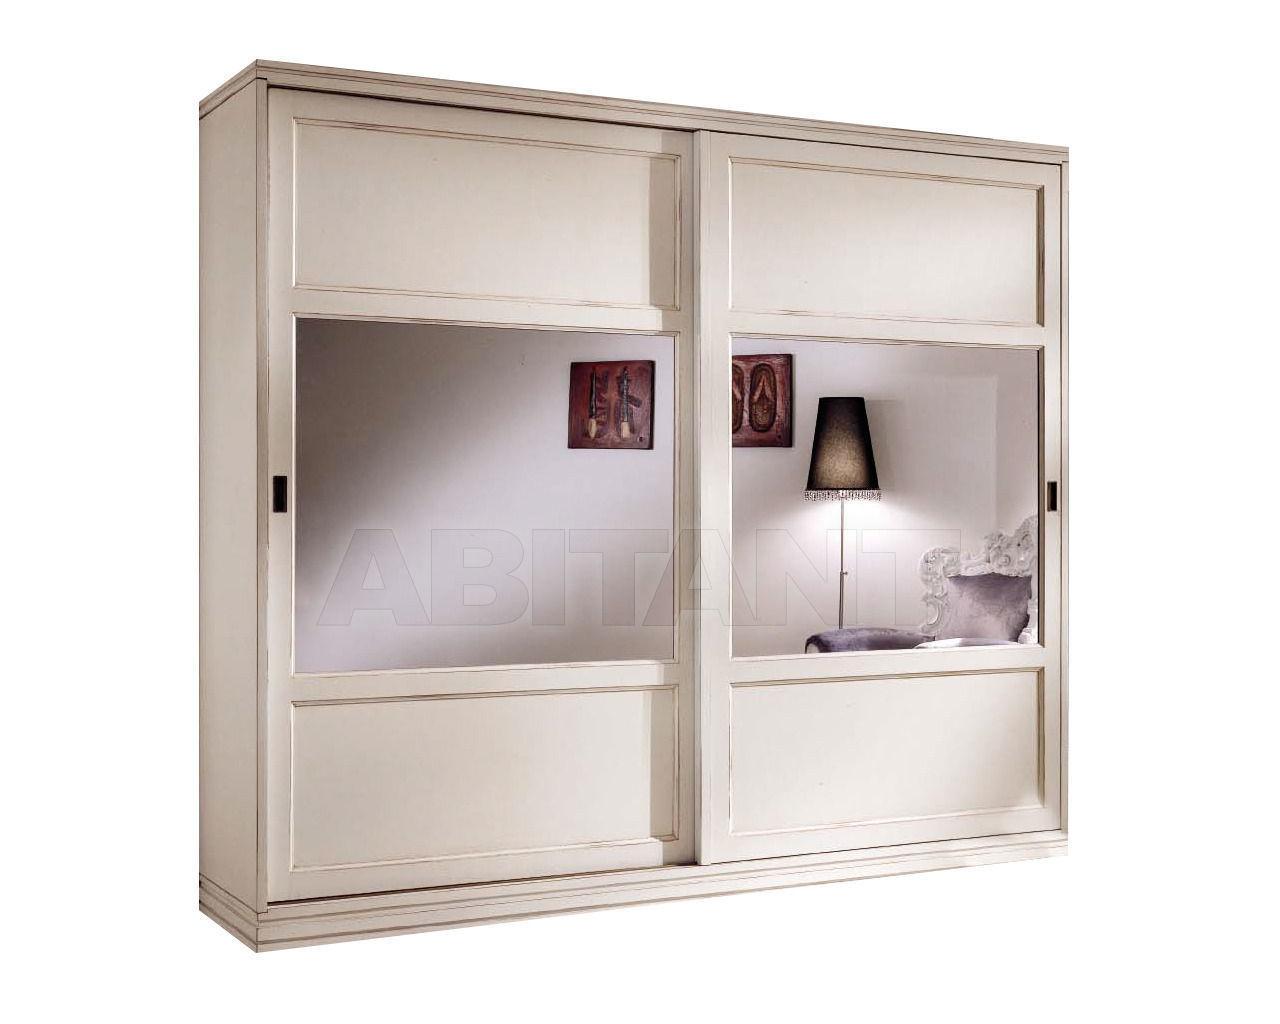 Купить Шкаф гардеробный Arredogi Domino ARMO2